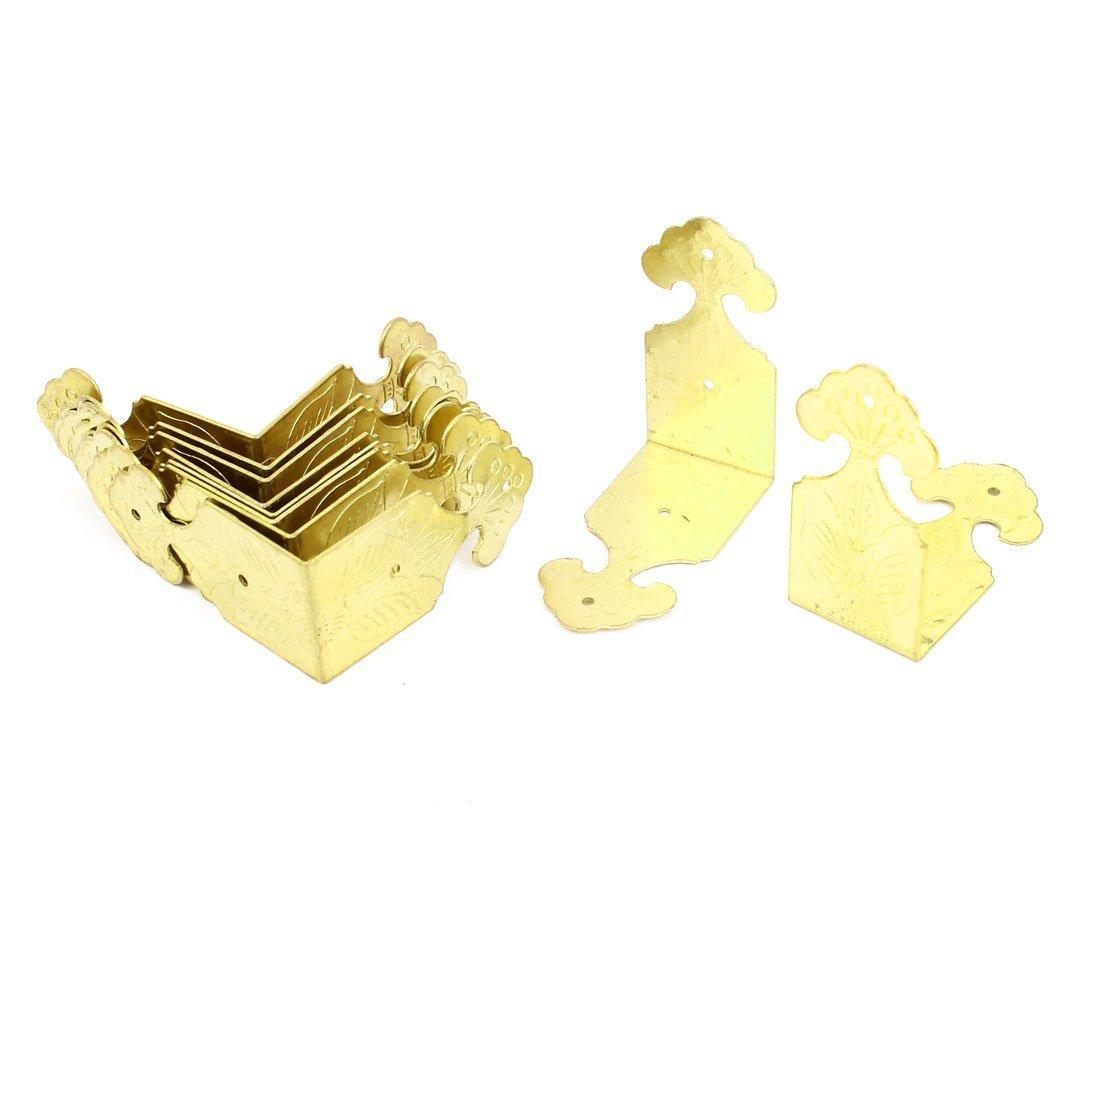 Metal Uxcell a14081900ux0656 Corner Braces Angle Brackets 45mm x 22mm x 45mm 10 Pcs Brass Tone